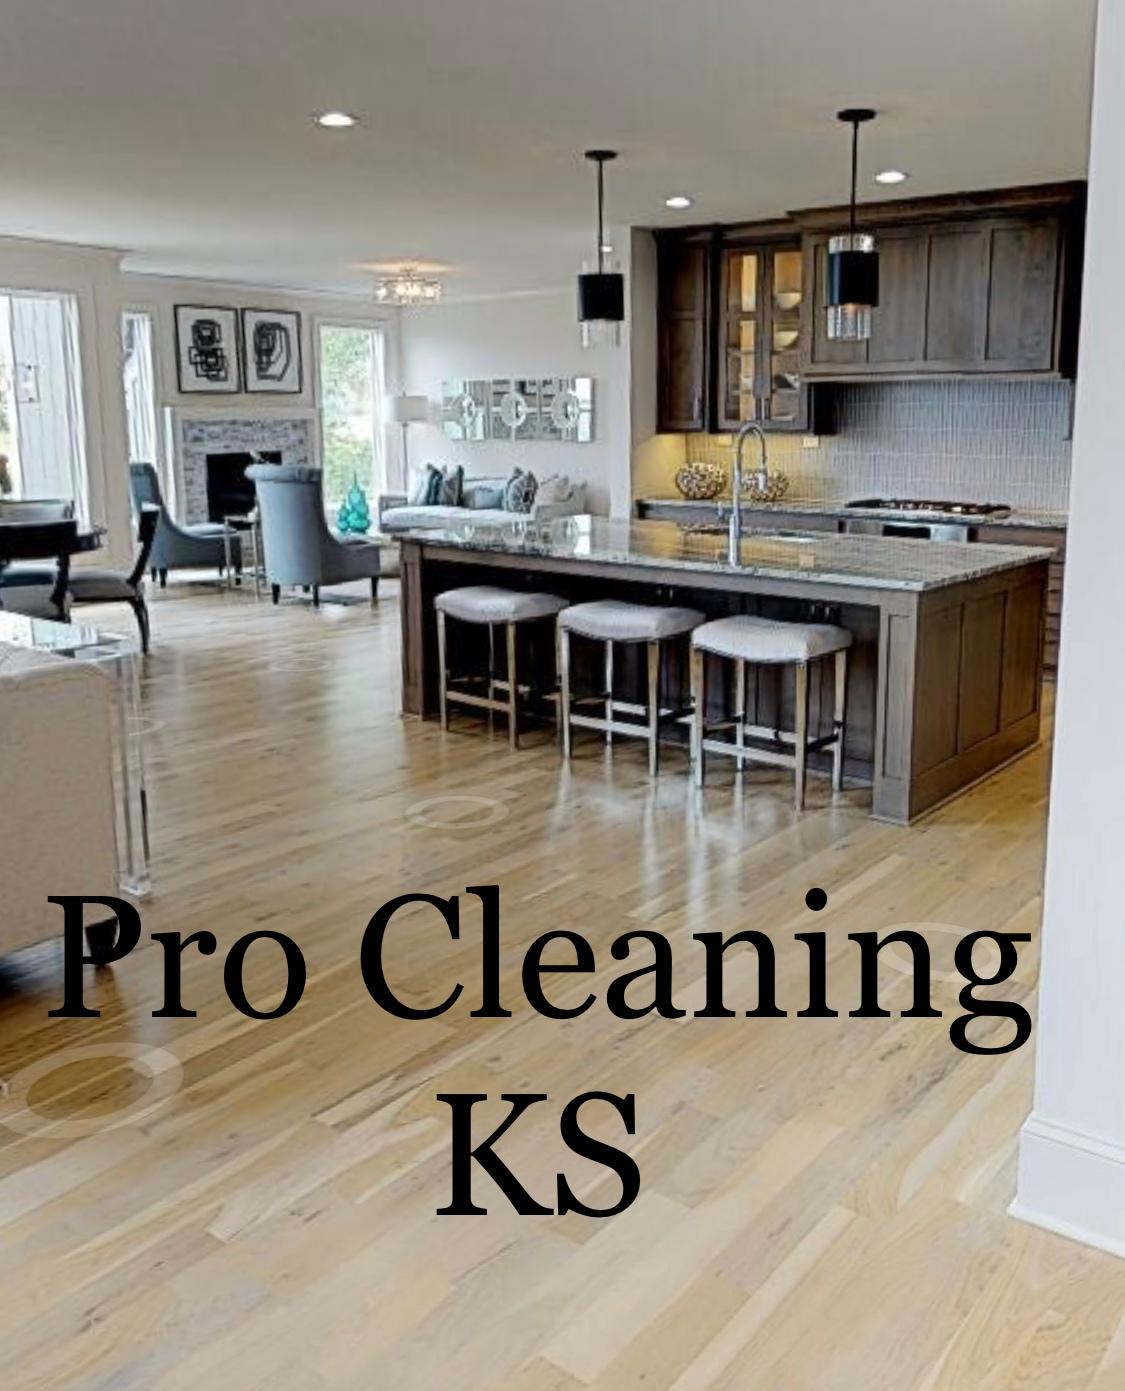 Pro Cleaning KS, LLC